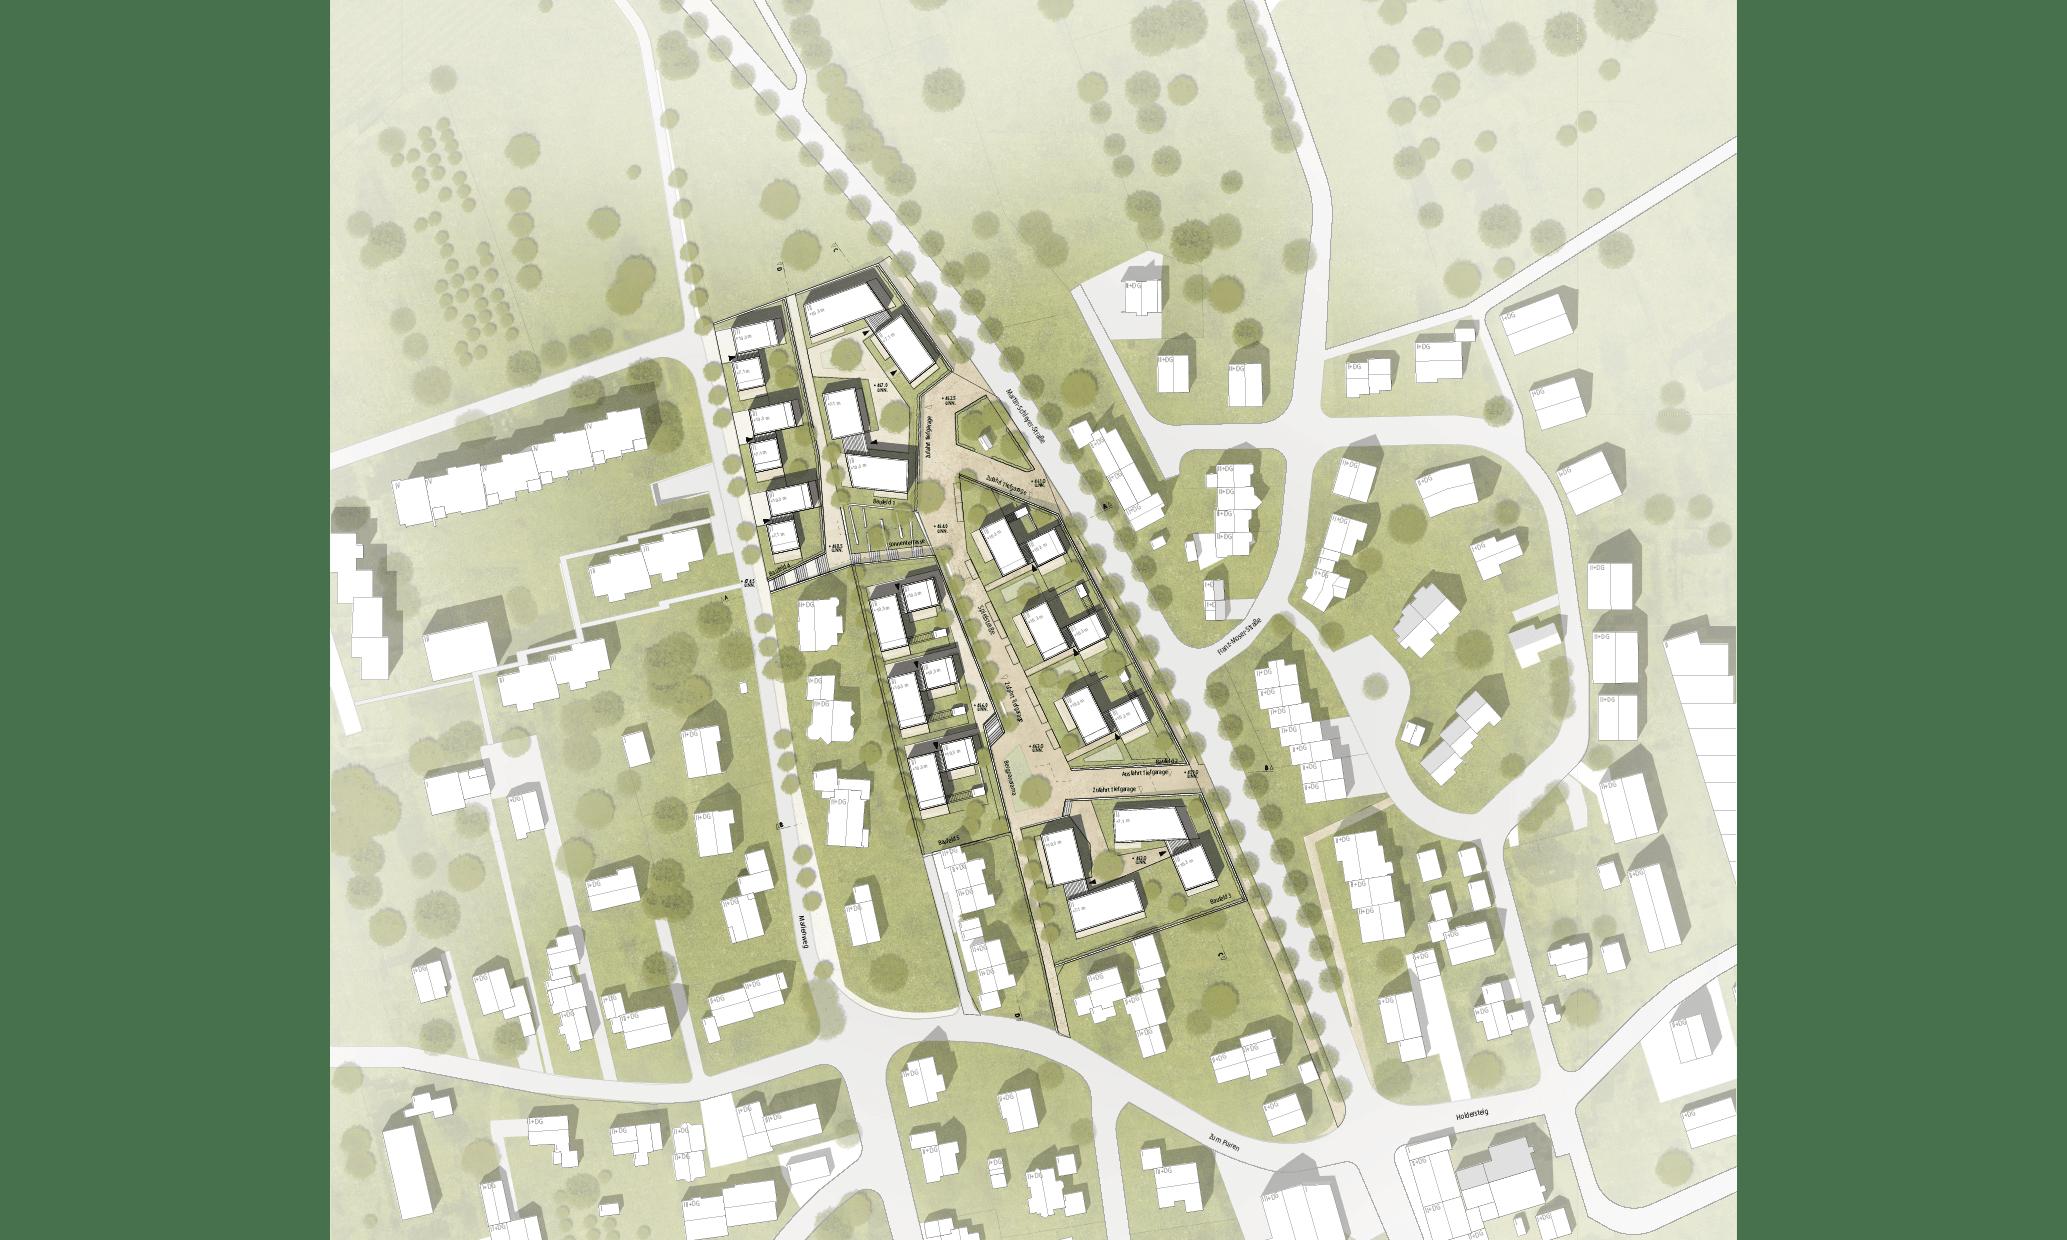 Konstanz Litzelstetten Marienweg Wettbewerb Lageplan Plan